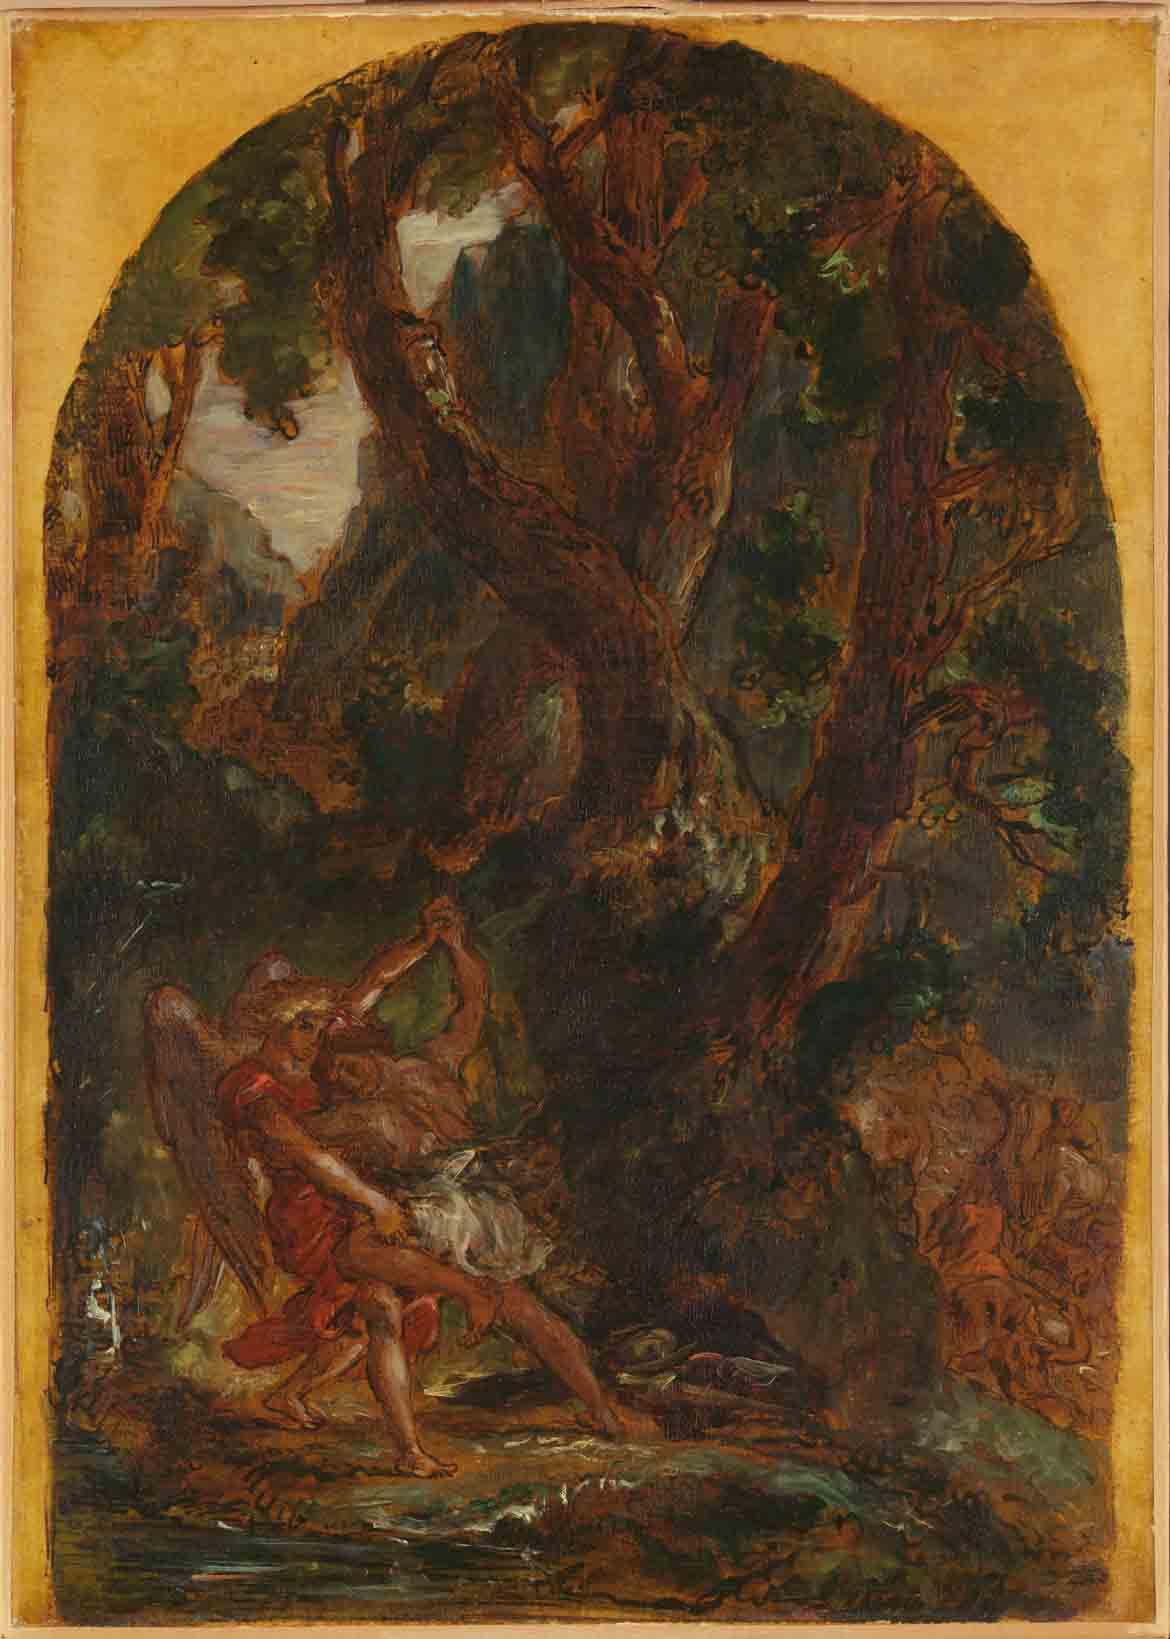 Jacob Wrestling with the Angel Eugène Delacroix exhibition at the Metropolitan Museum of Art